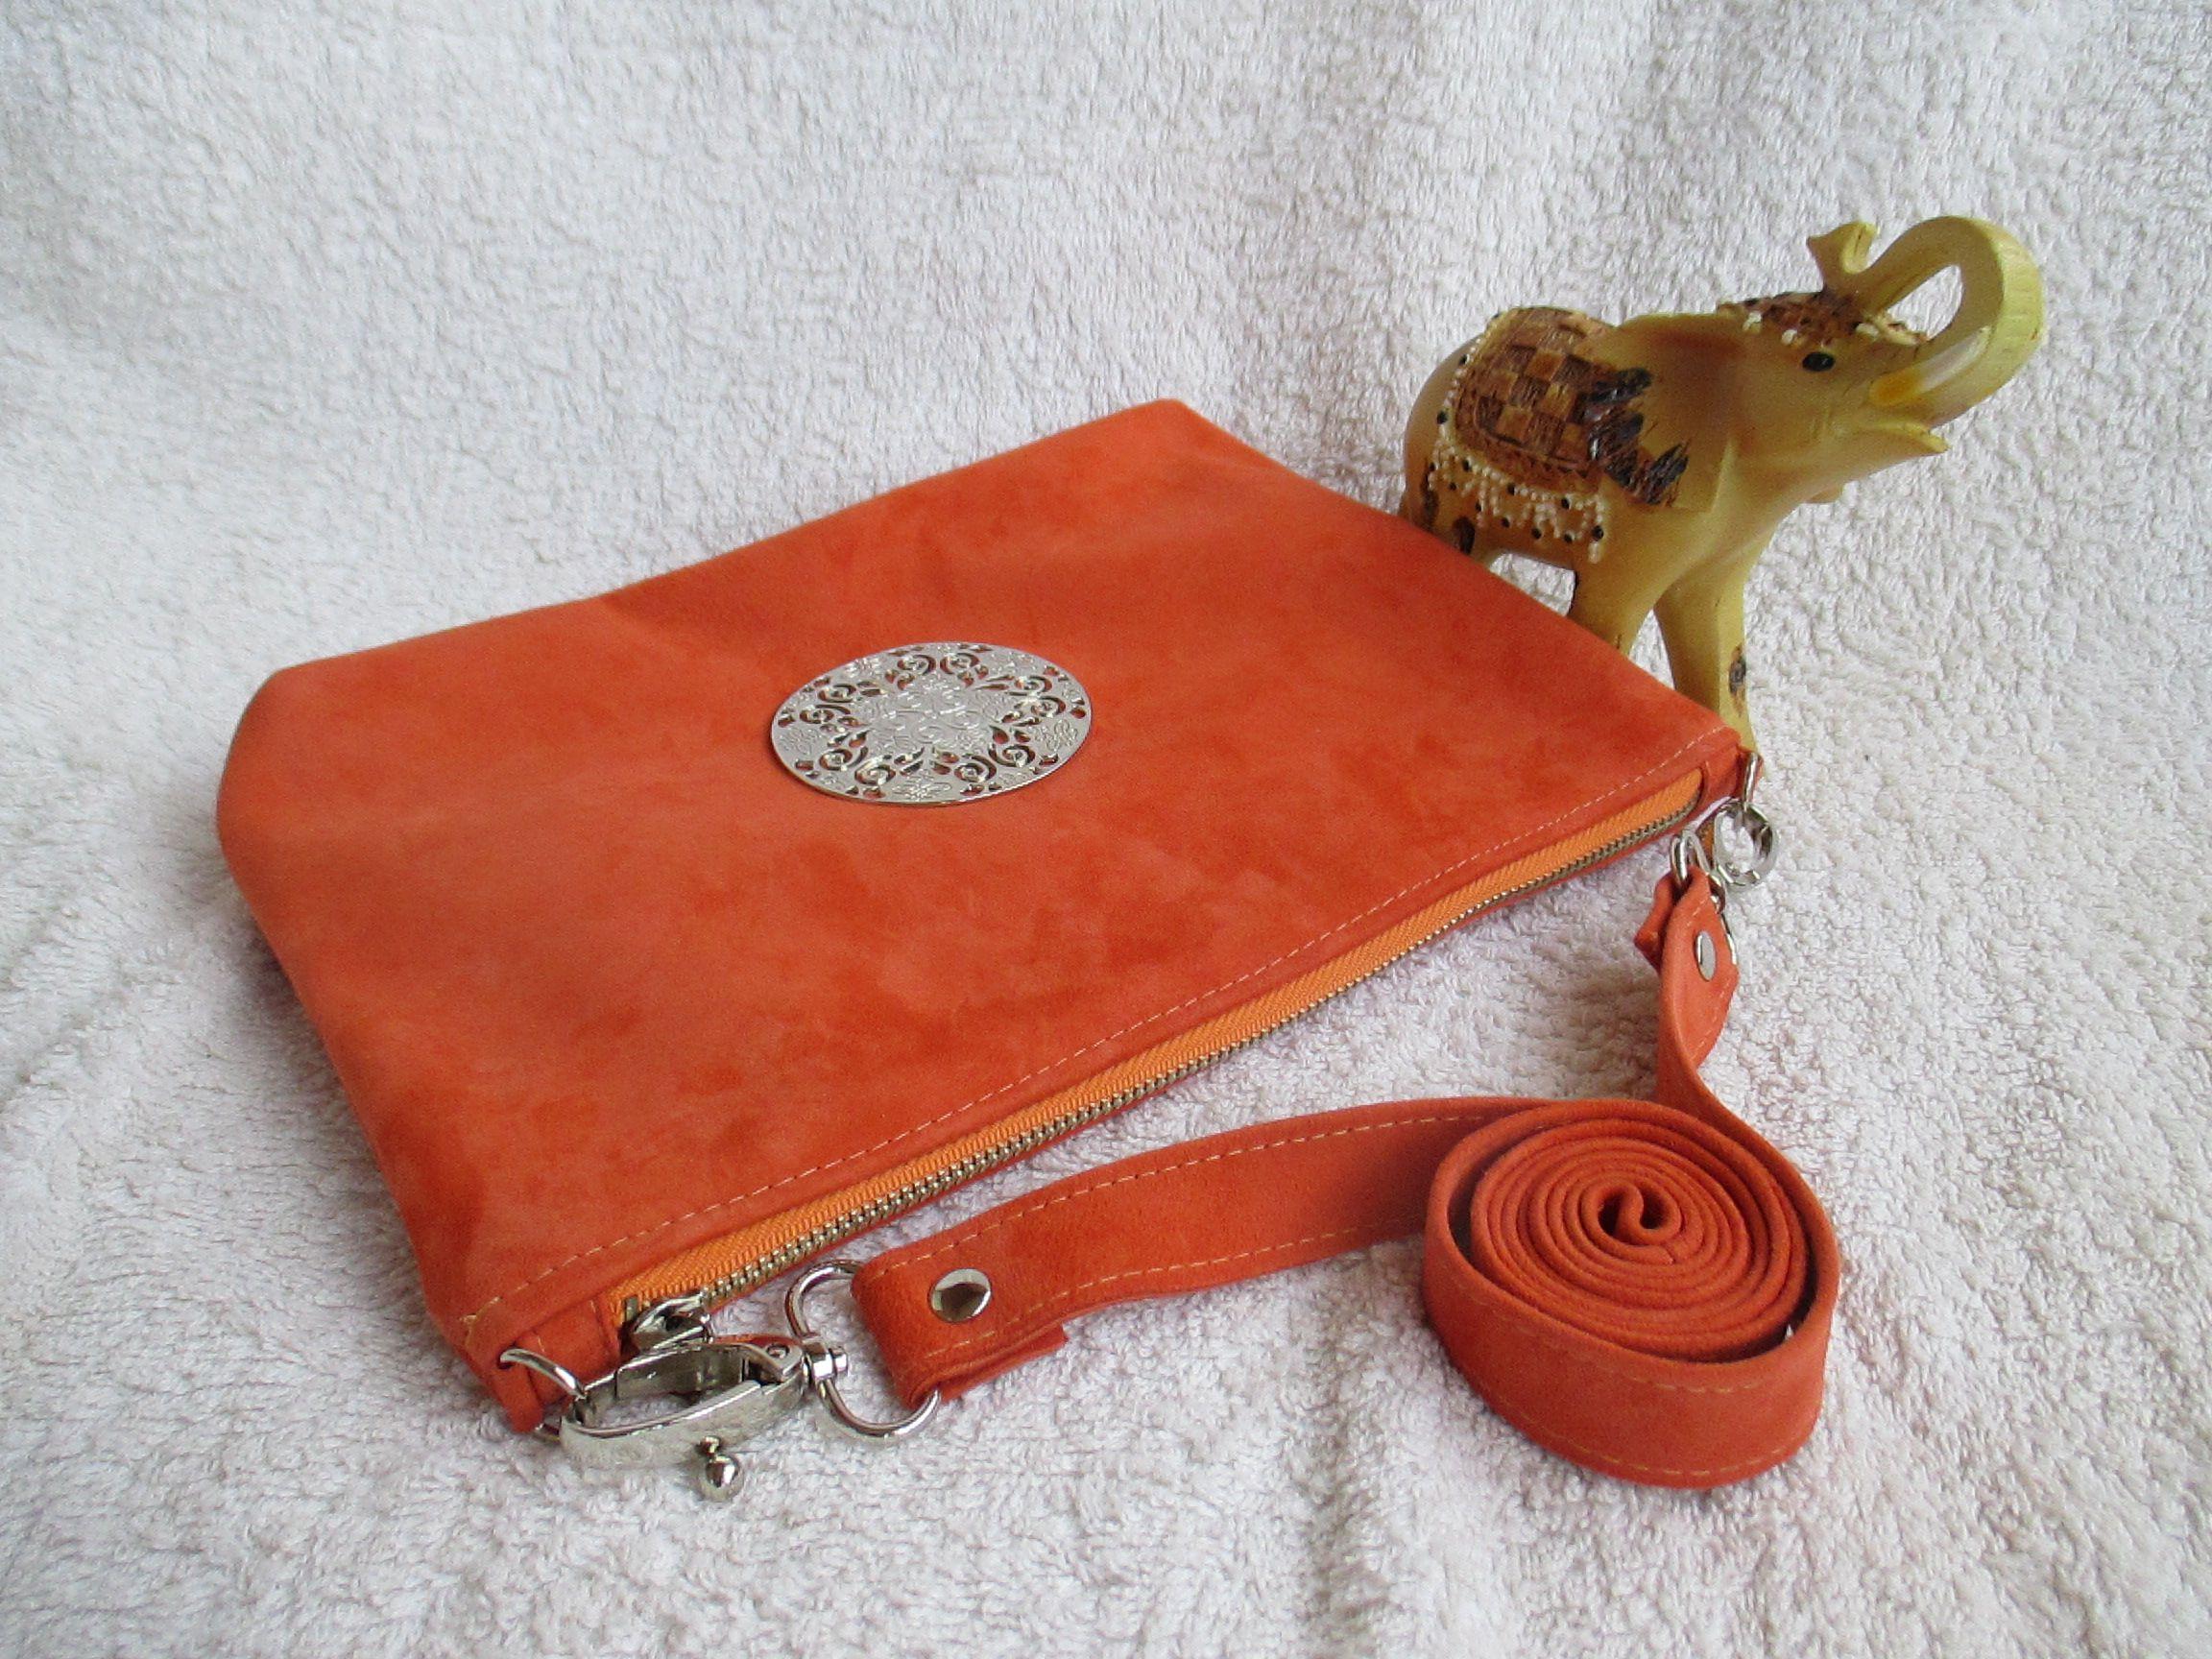 bag leather clutch accessories orange